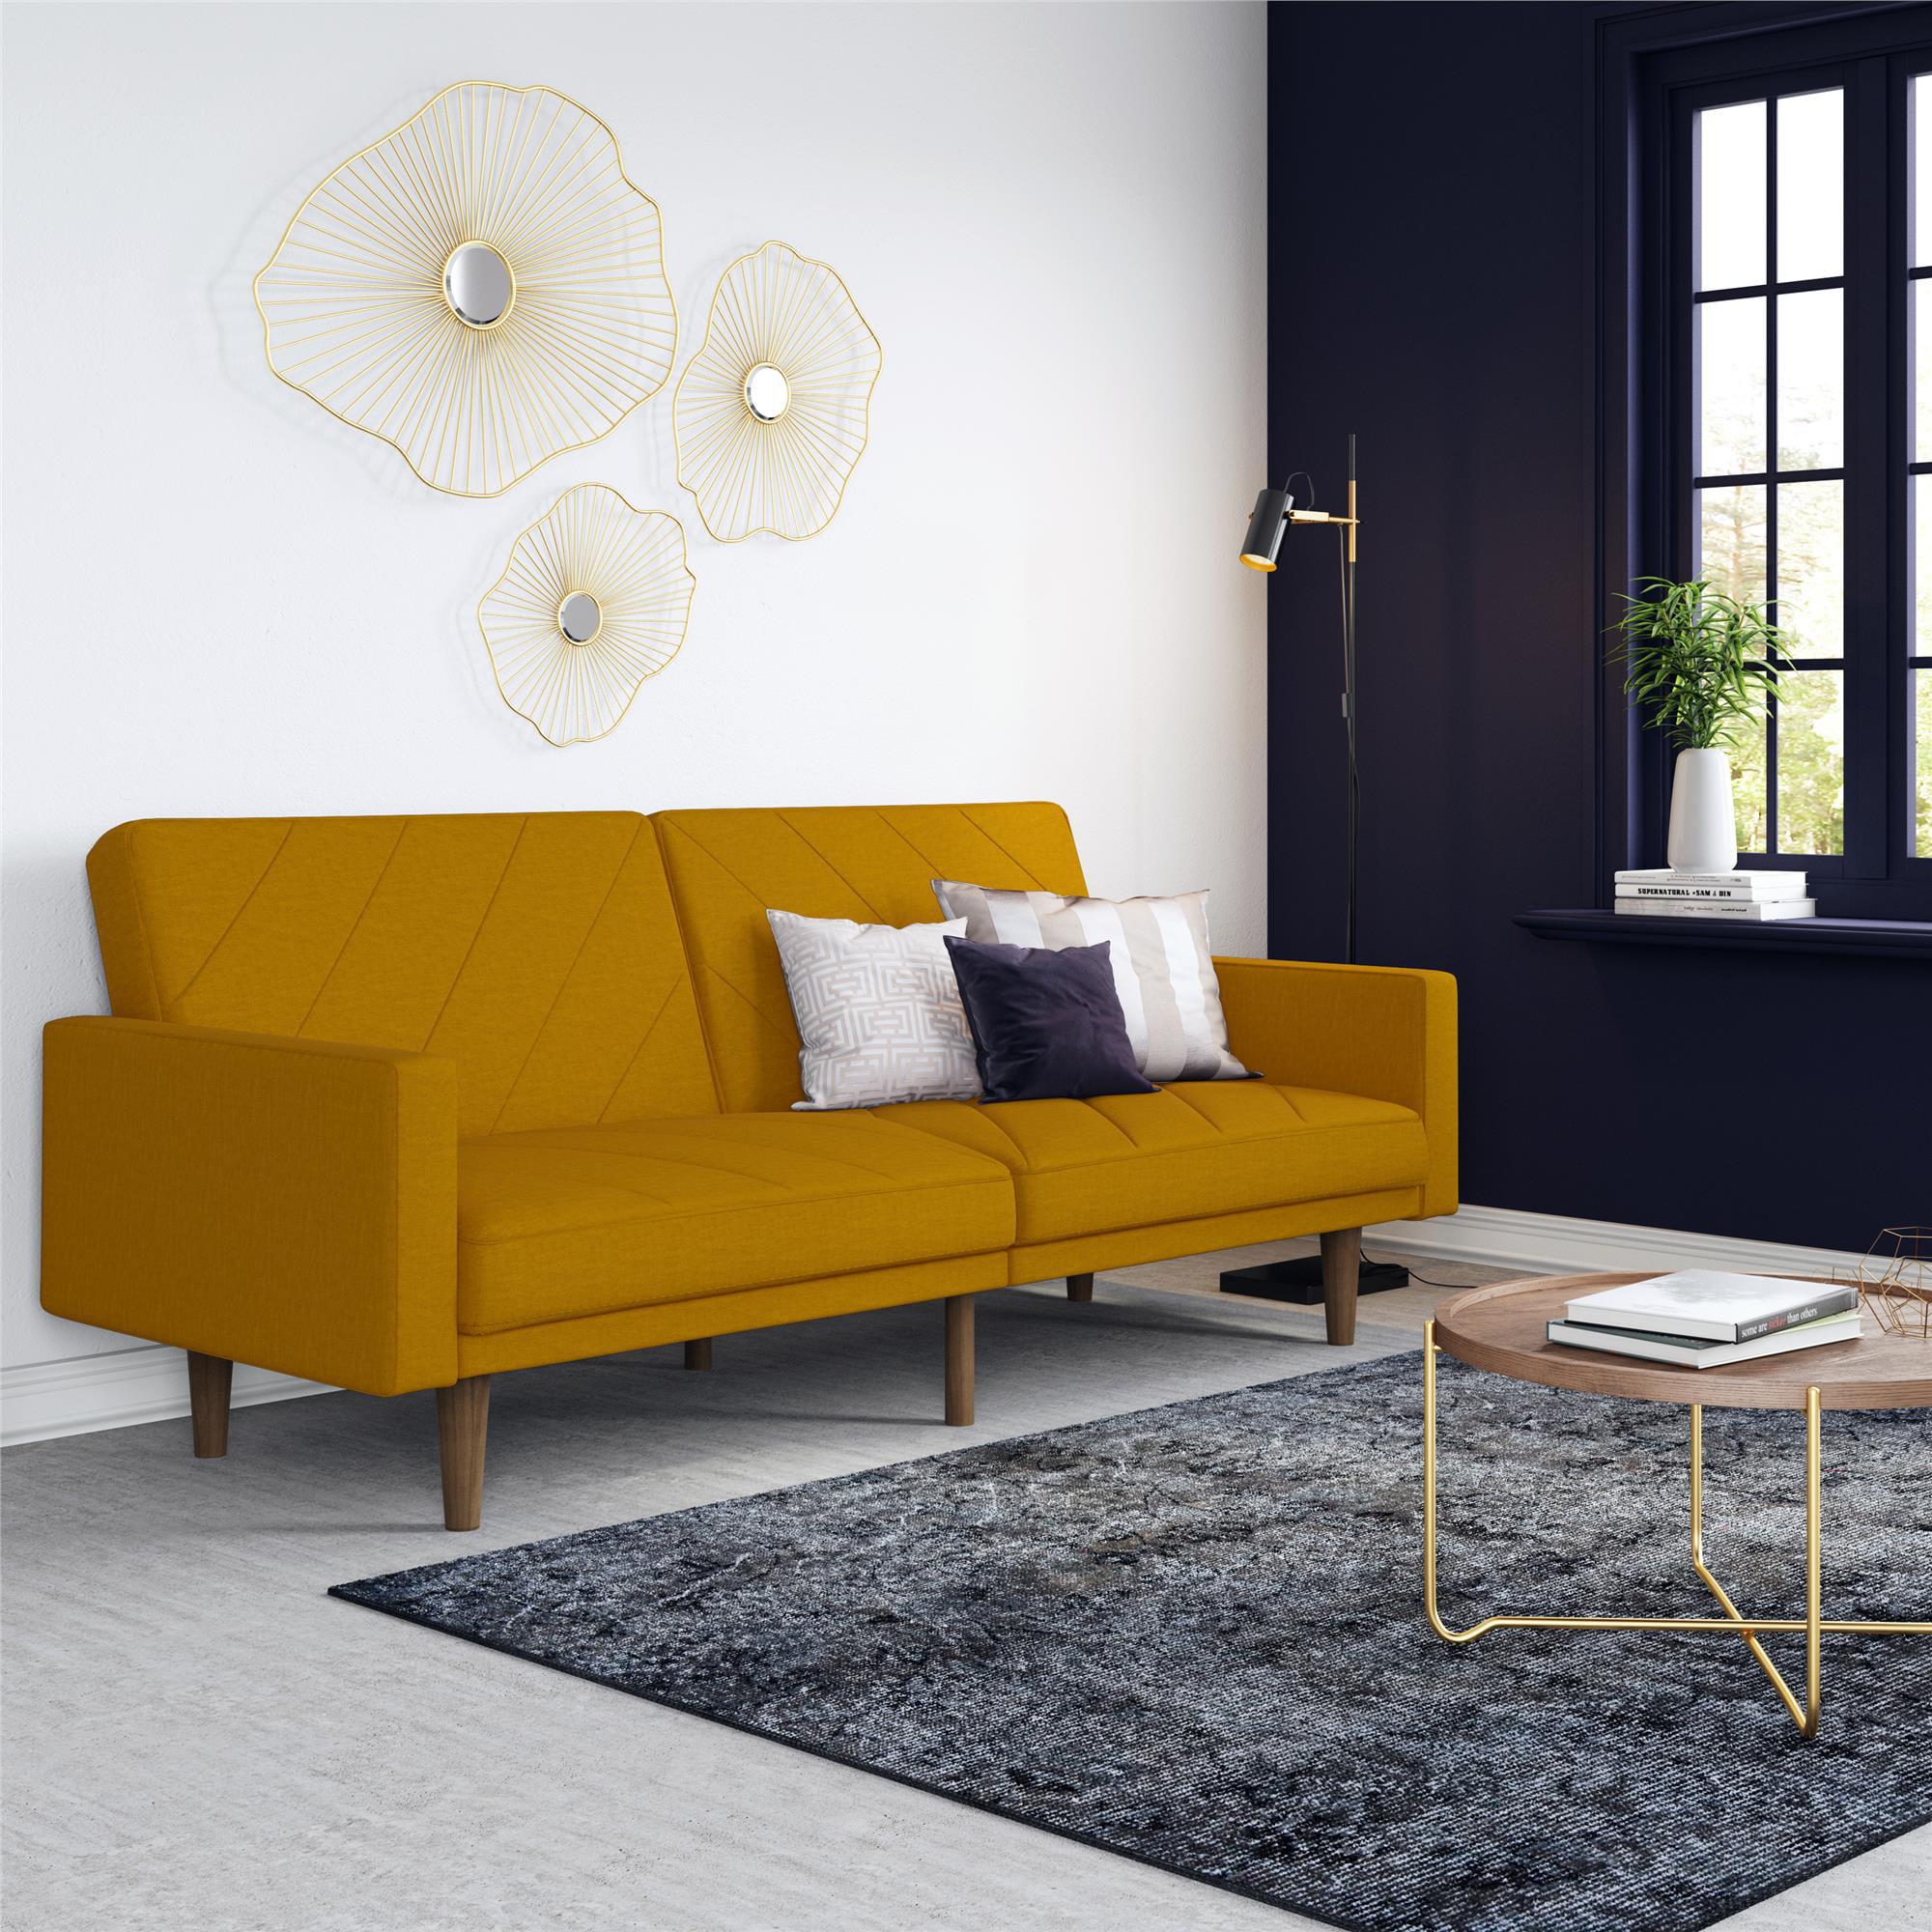 DHP Modern Retro Paxson Sofa Bed, Mustard Yellow - Walmart.com - Walmart.com